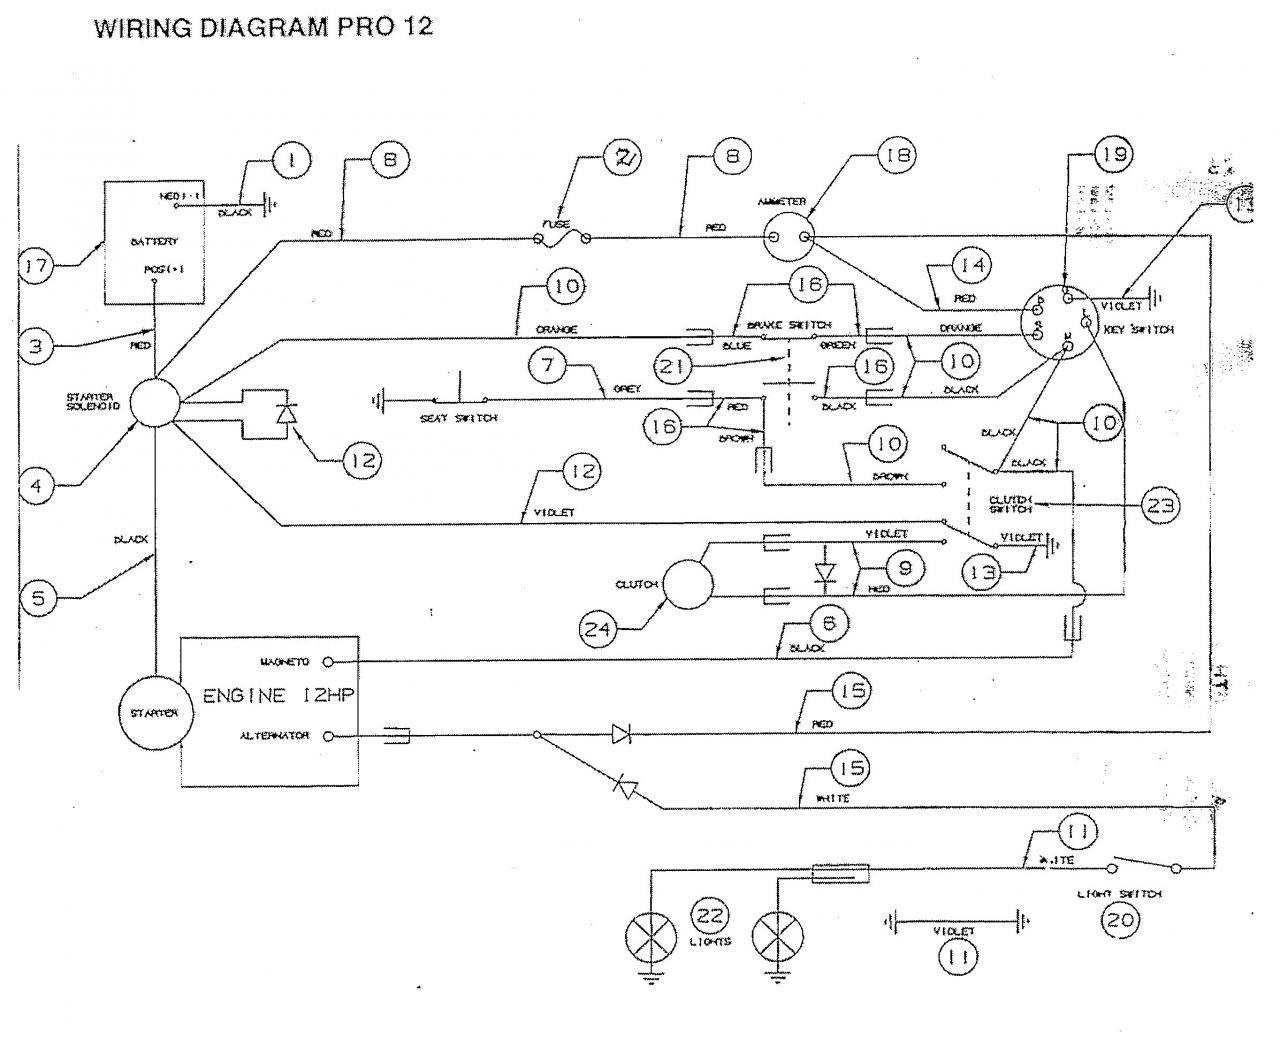 lawn mower key switch diagram 99 tahoe heated seat wiring scotts riding get free image